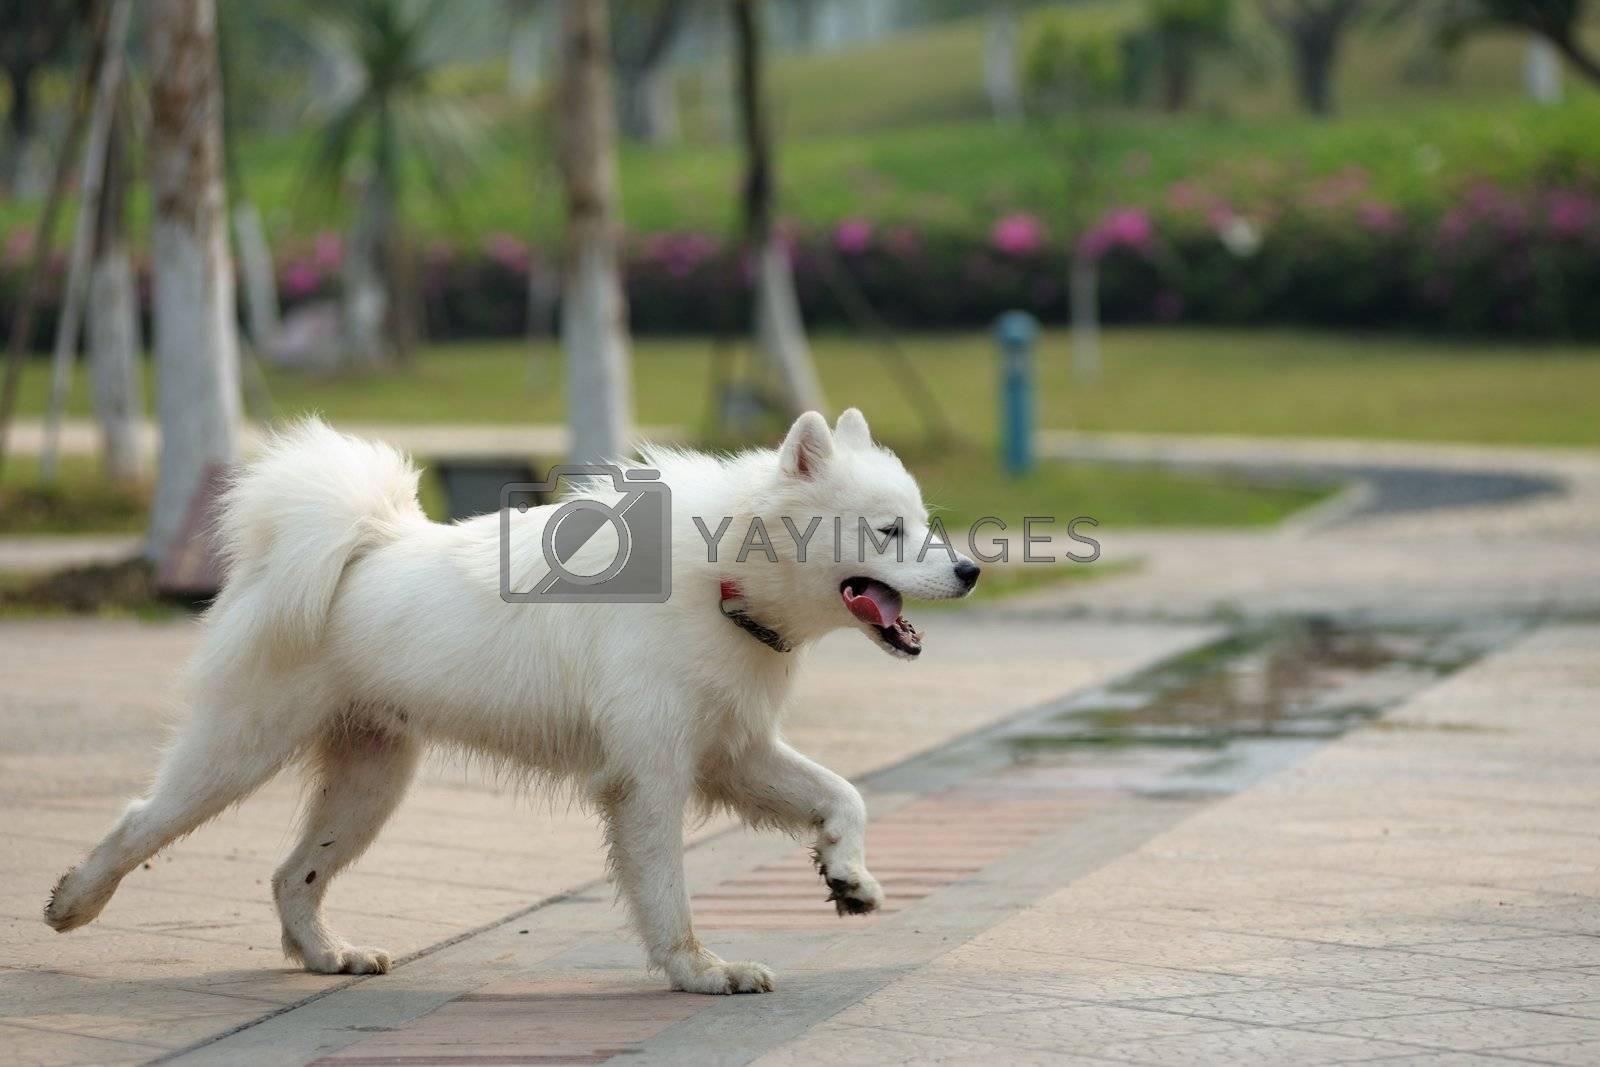 A happy samoyed dog running on the ground